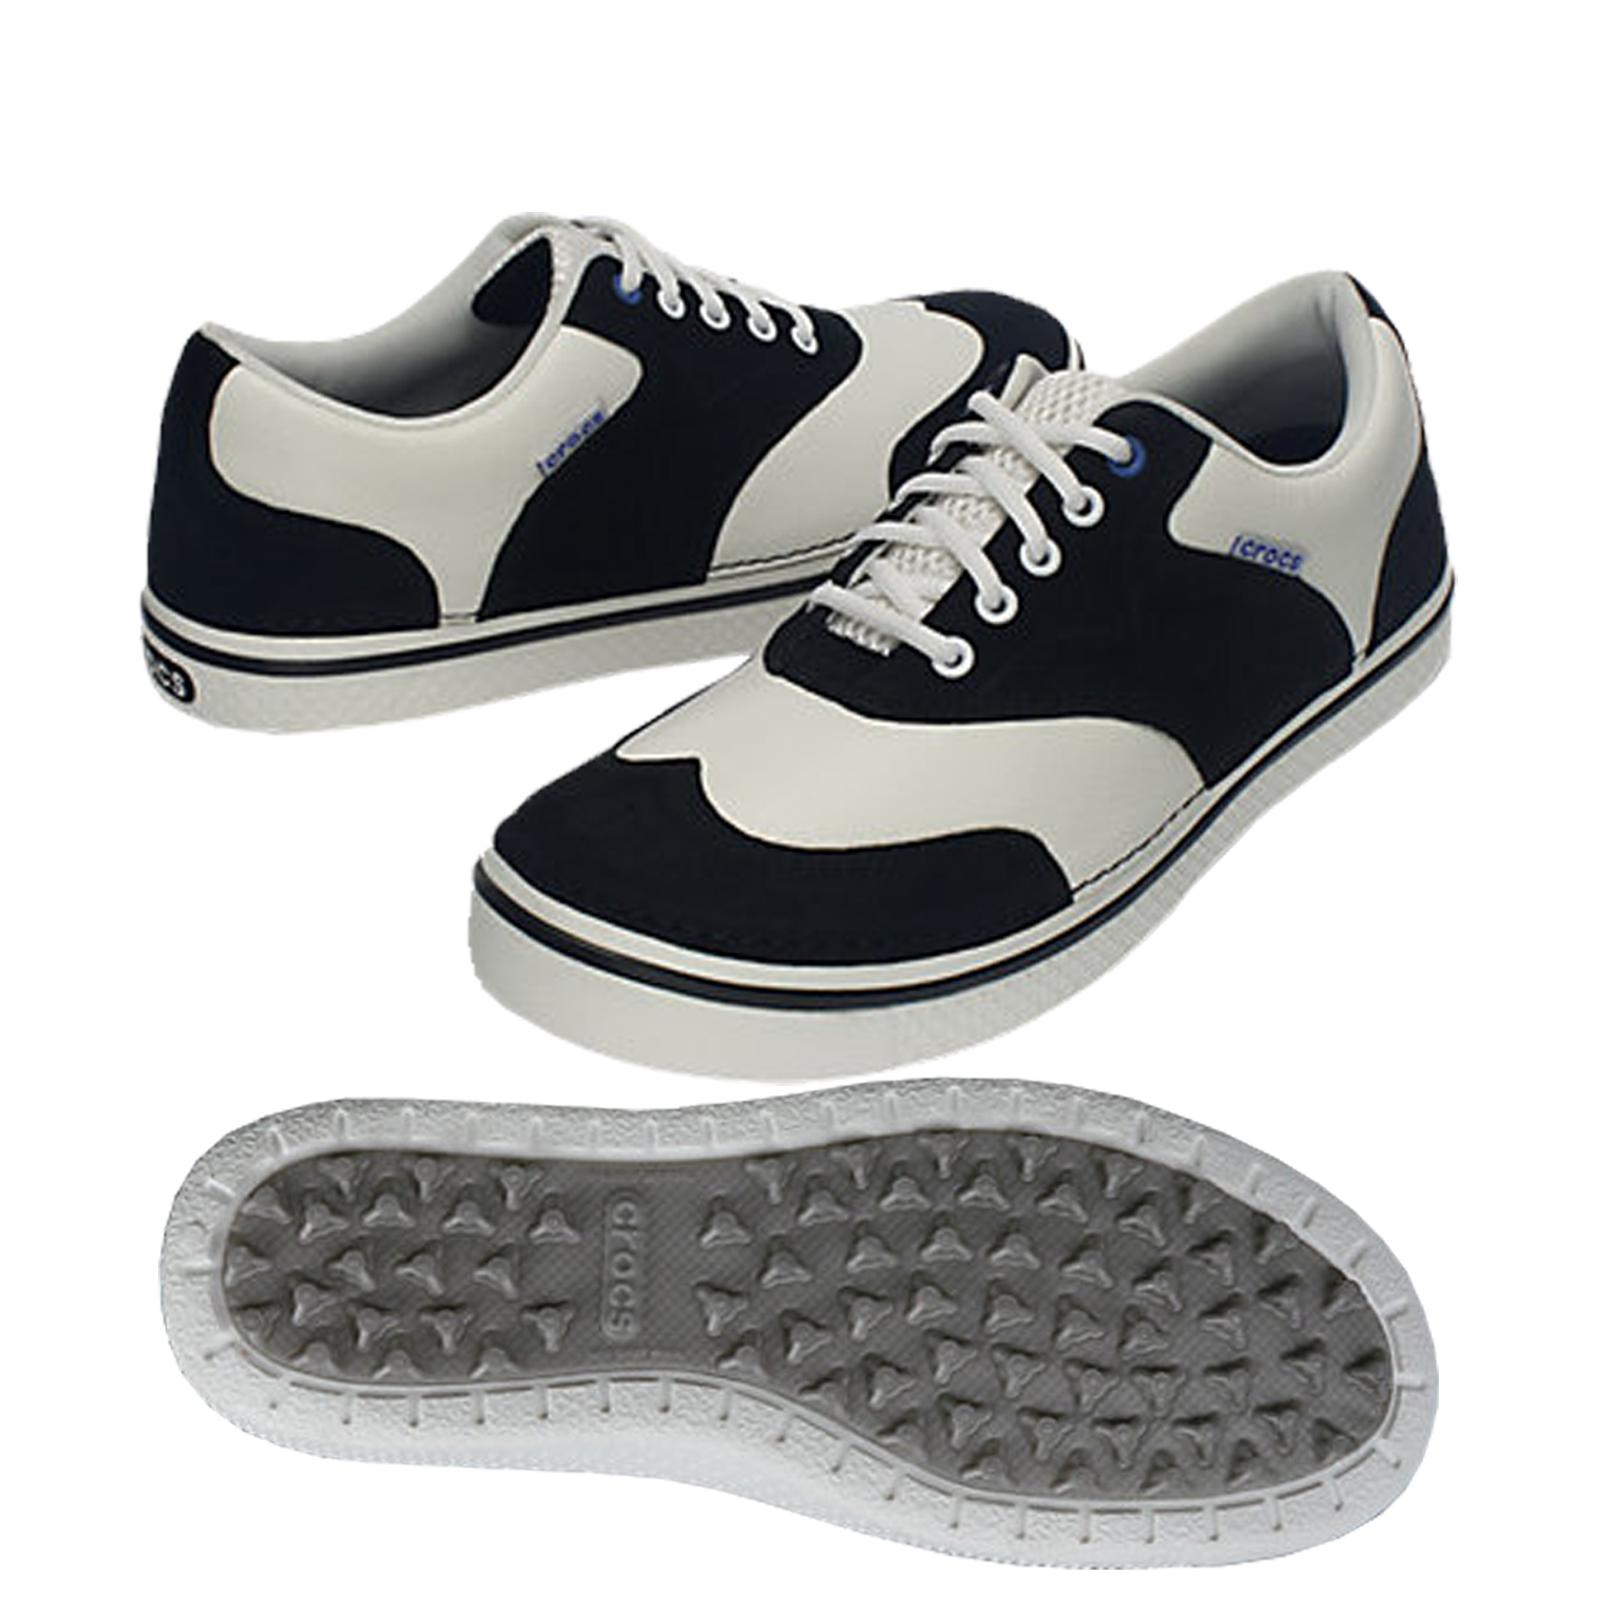 Crocs Preston Men S Golf Shoe Grey Pictures To Pin On